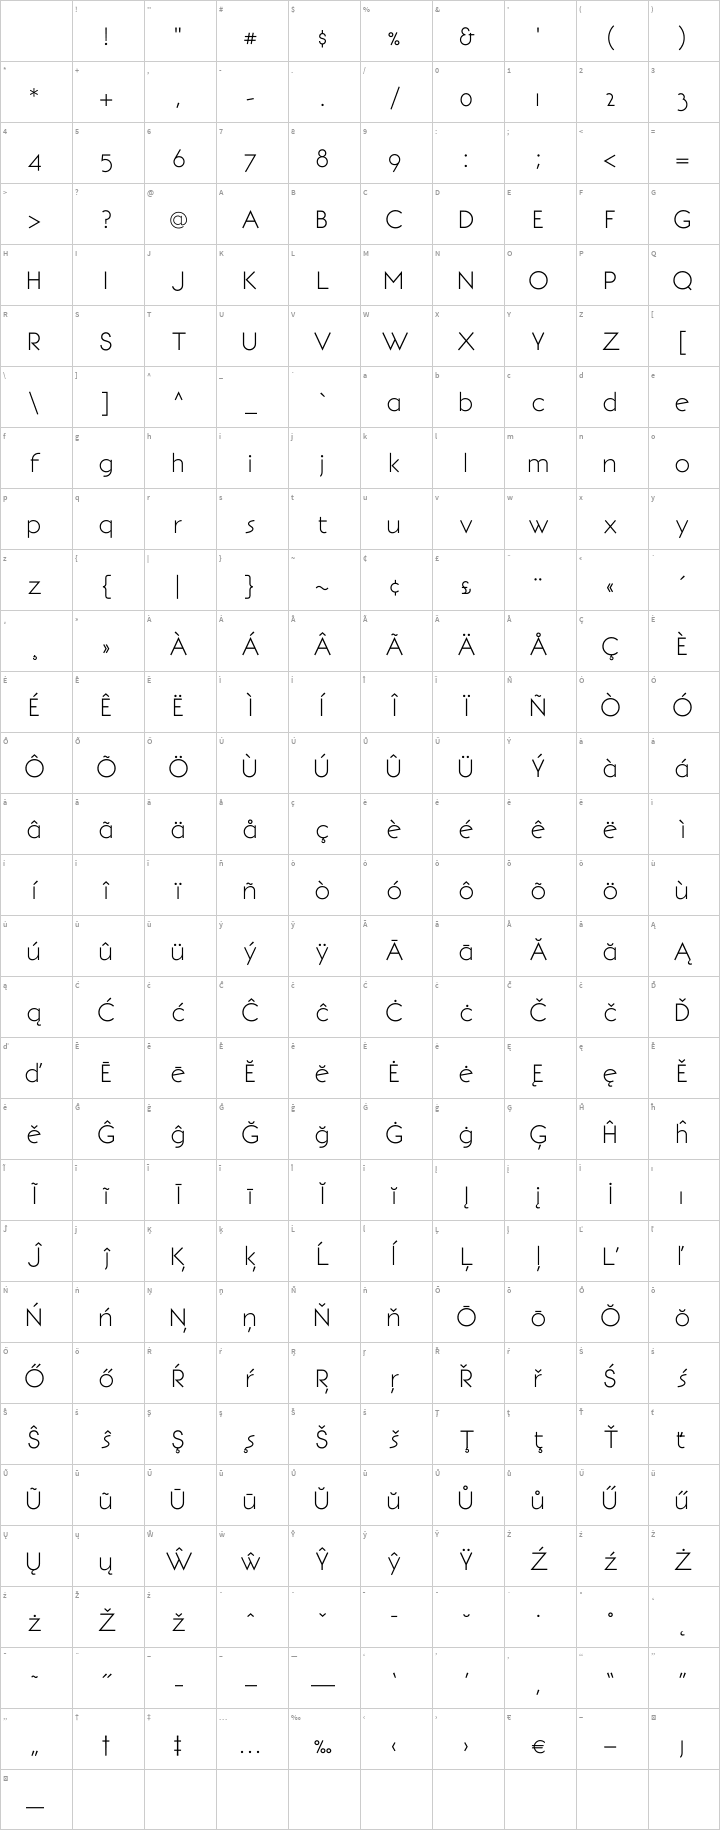 BonvenoCF Font Free by Barry Schwartz » Font Squirrel